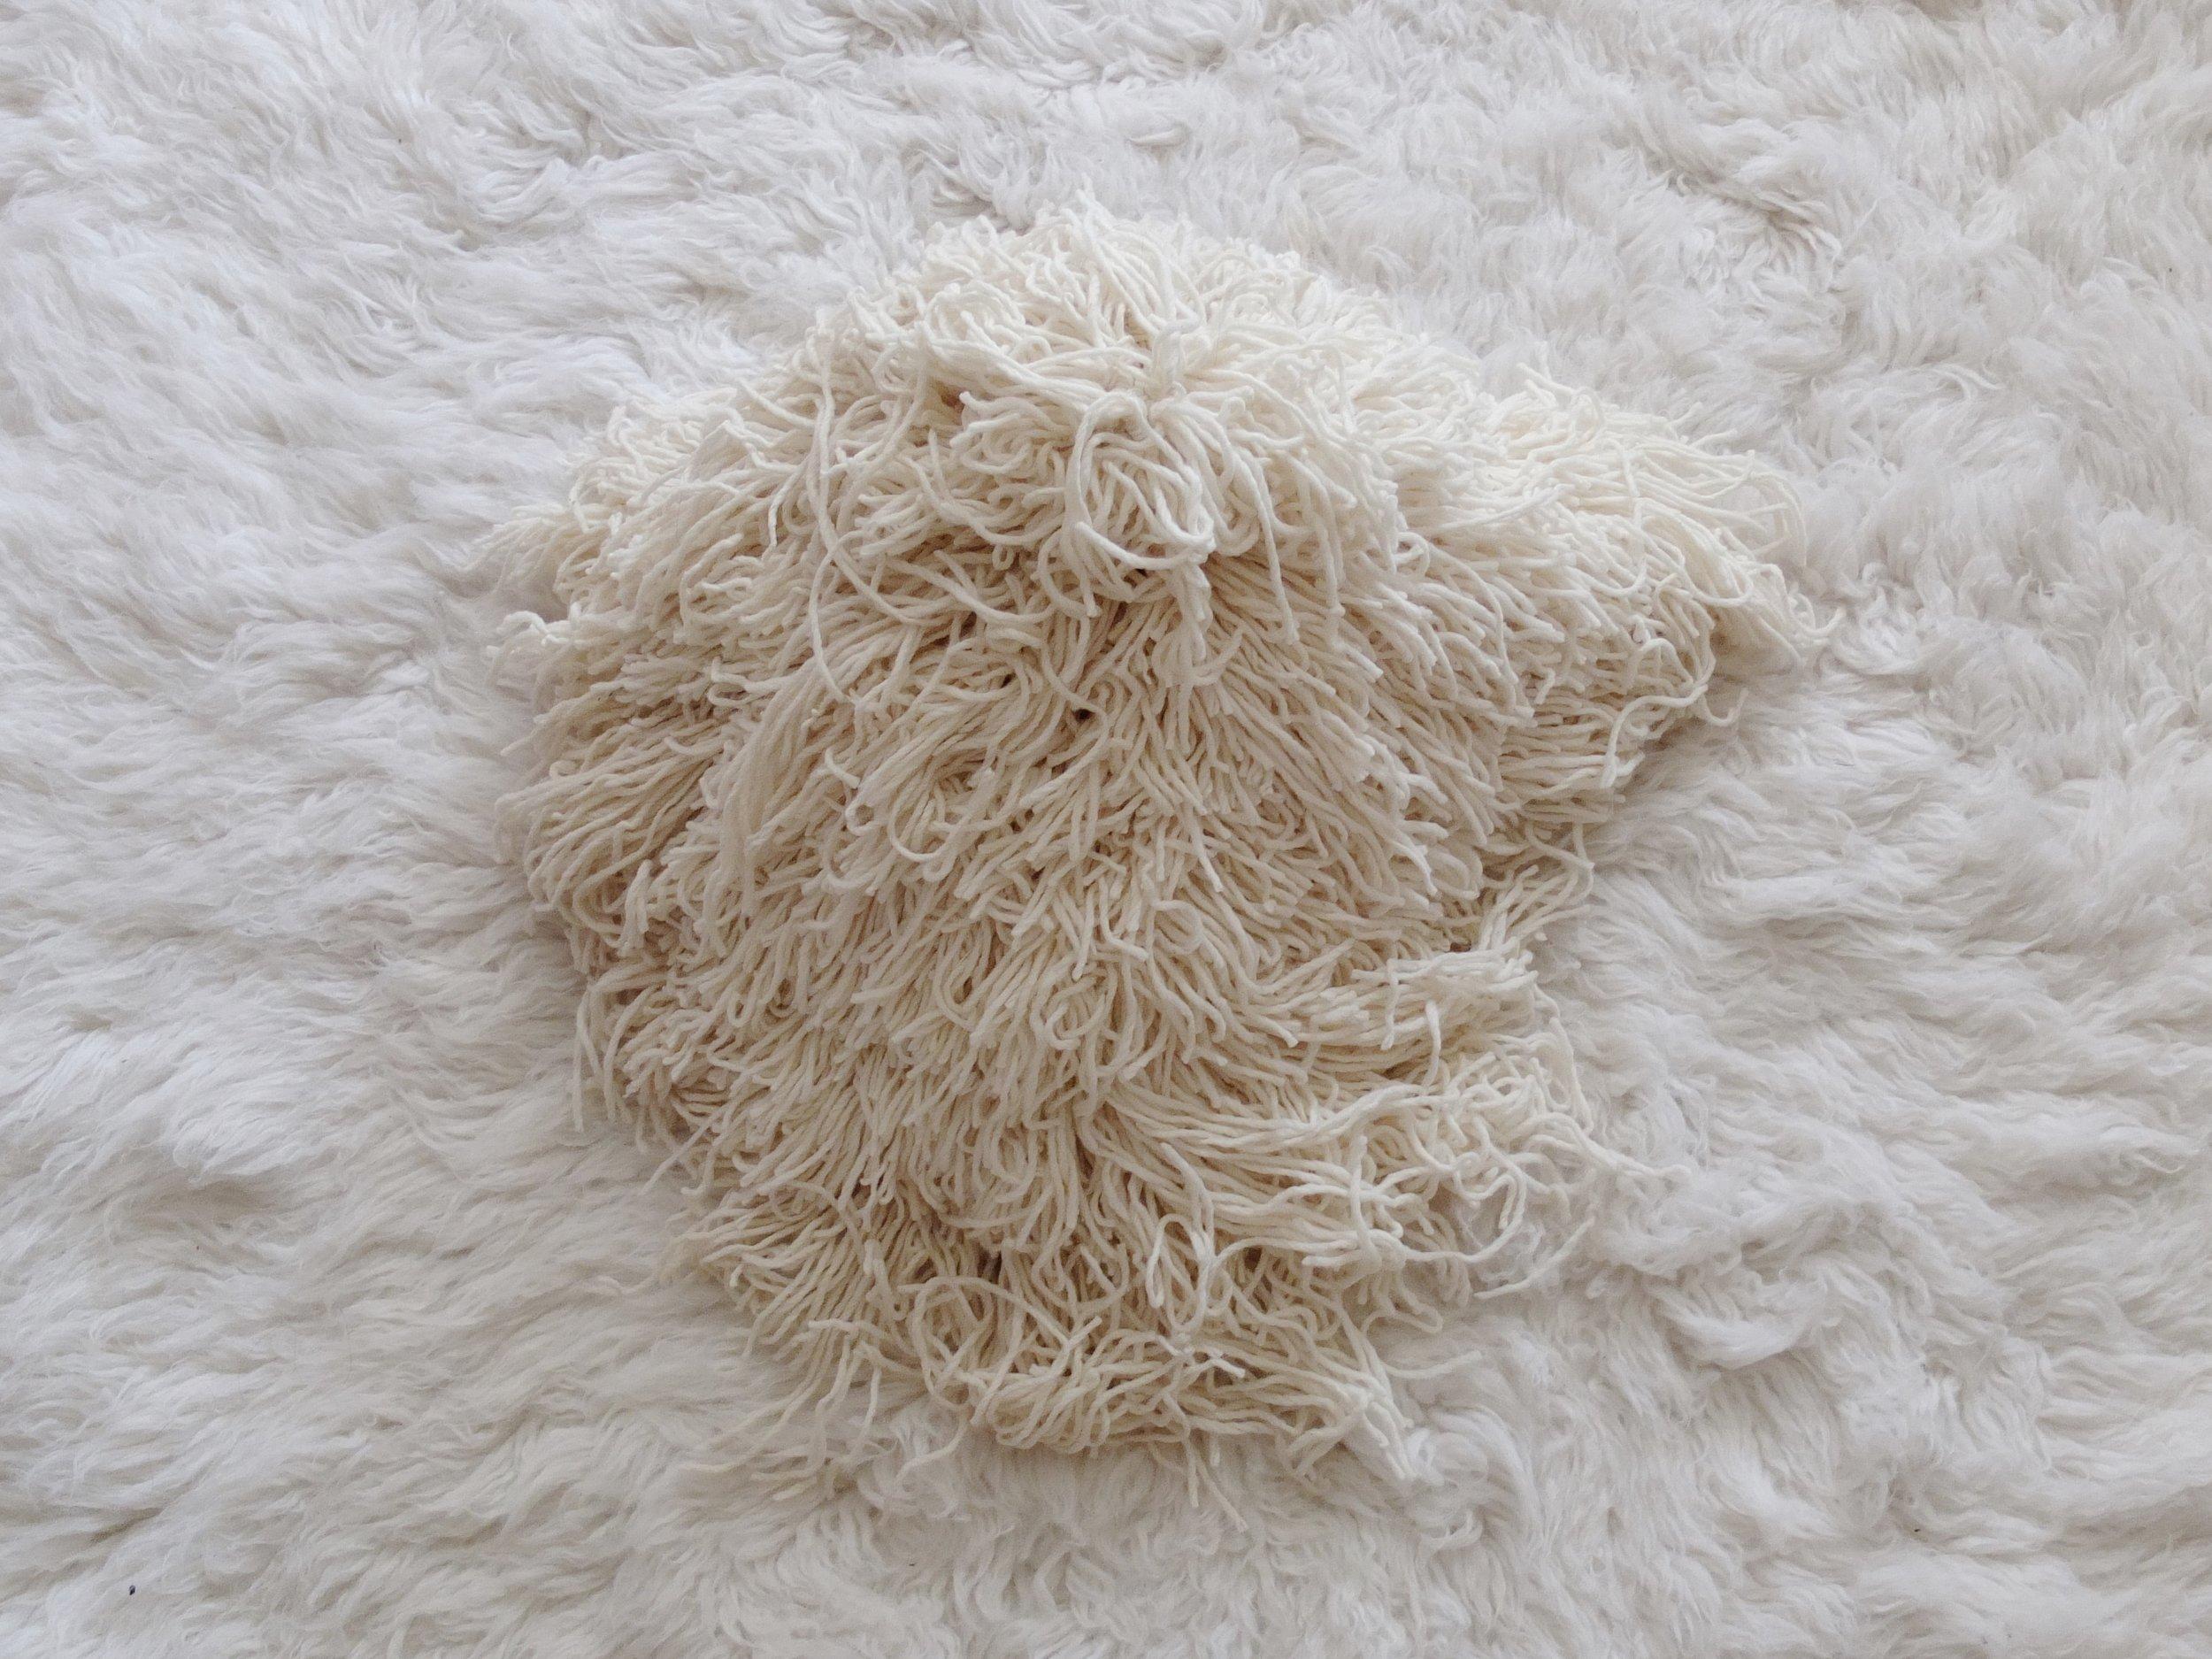 doucement-penelope-pyramid-pillow.JPG